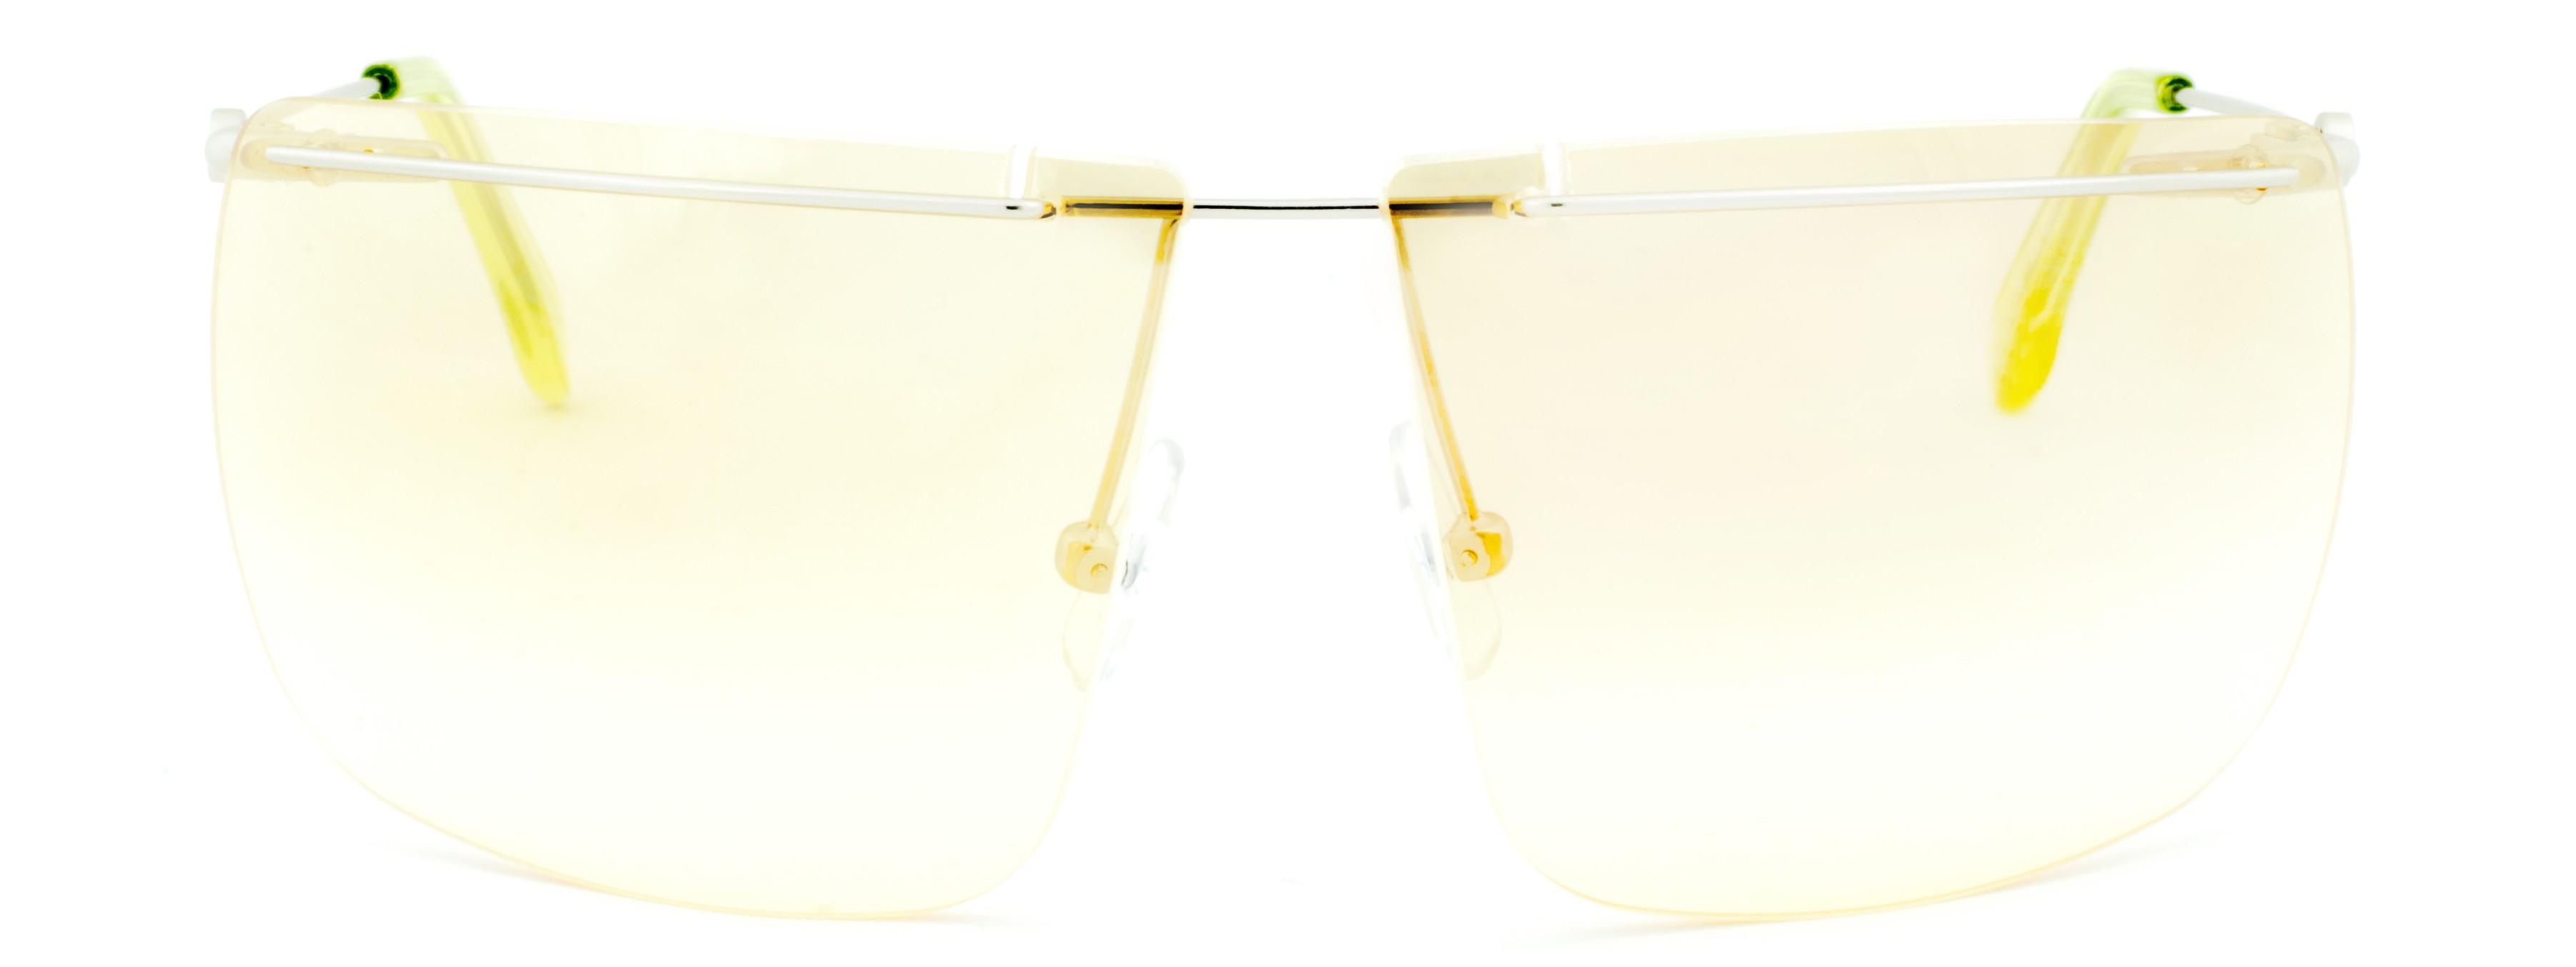 a6778986923e CK 2133 S 369 Yellow - Men sunglasses - Sunglasses Online shop - eyeglasses  and sunglasses